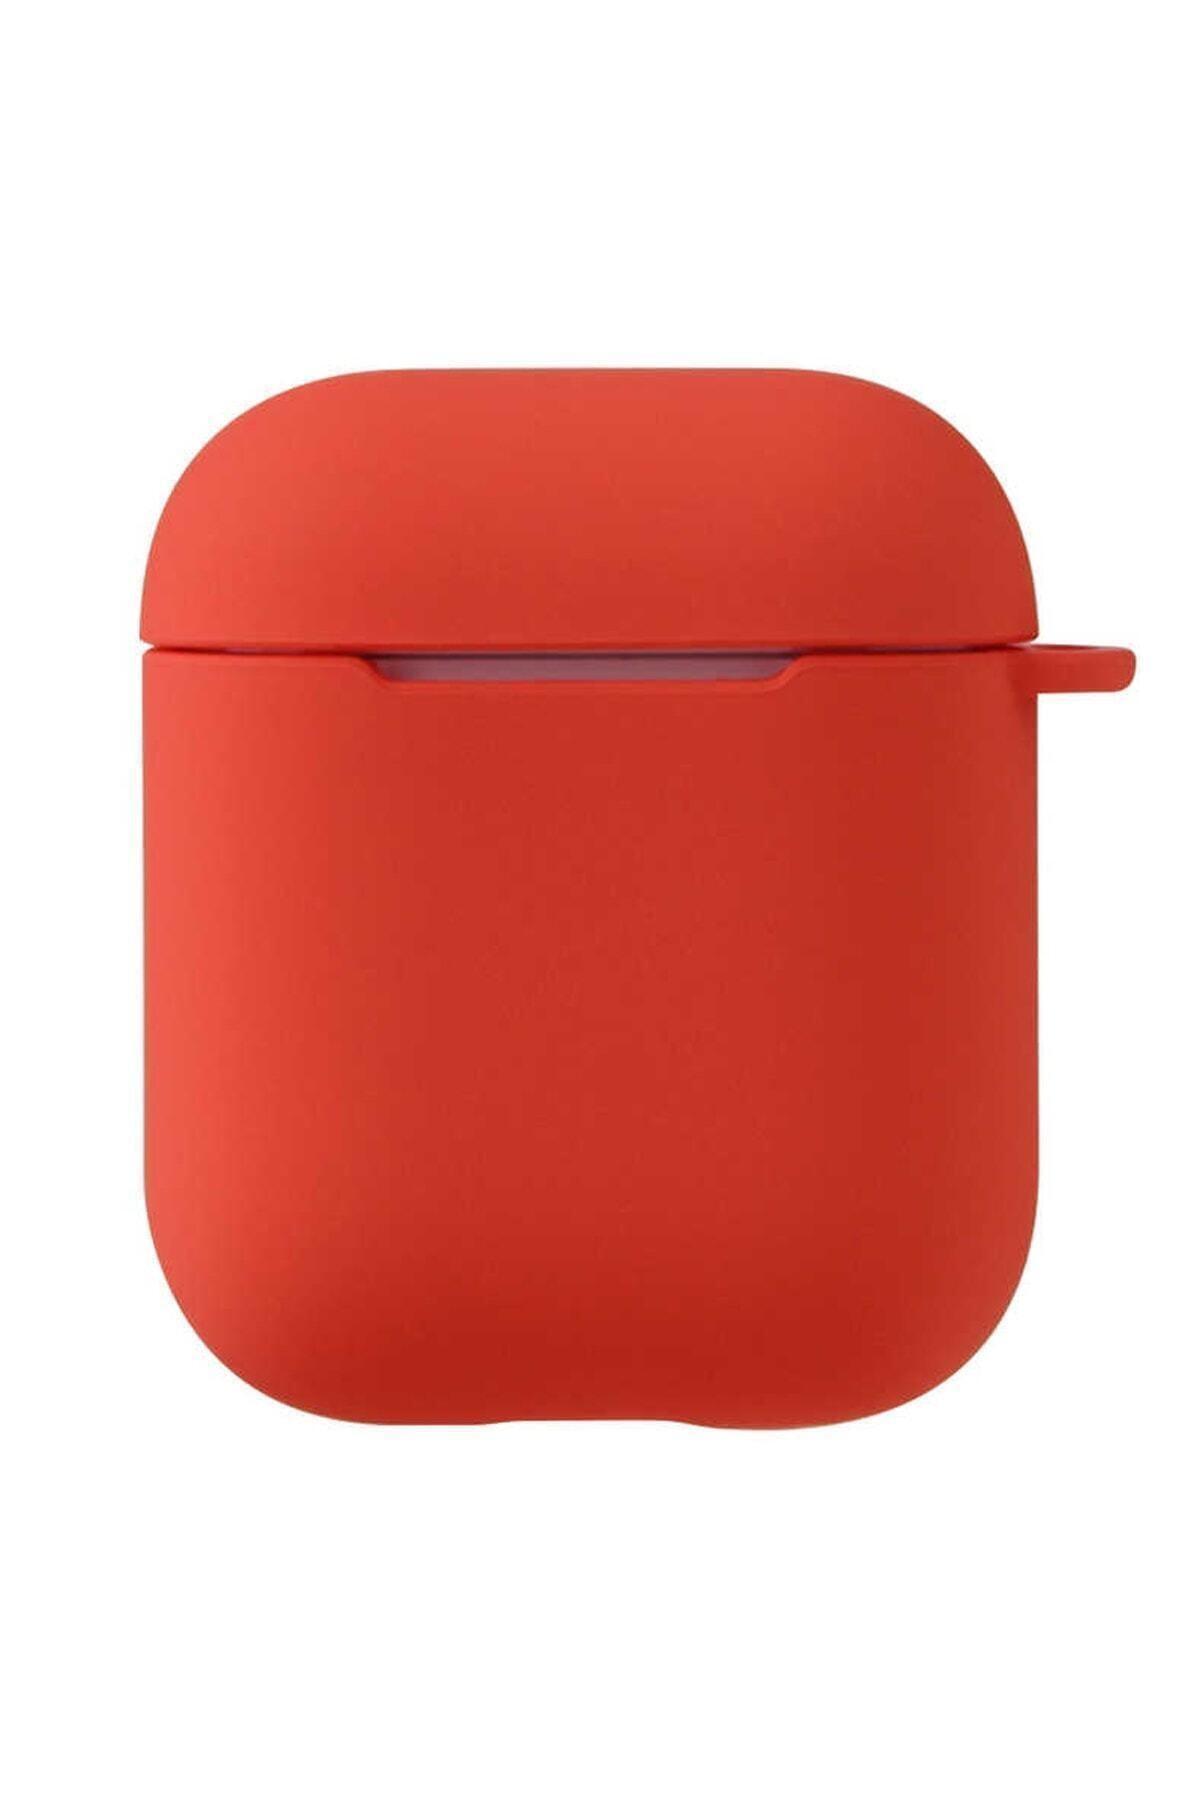 Sunix Airpods  Uyumlu 2. Nesil Kılıf Pastel Renkli Silikon Koruma Kopçalı 1